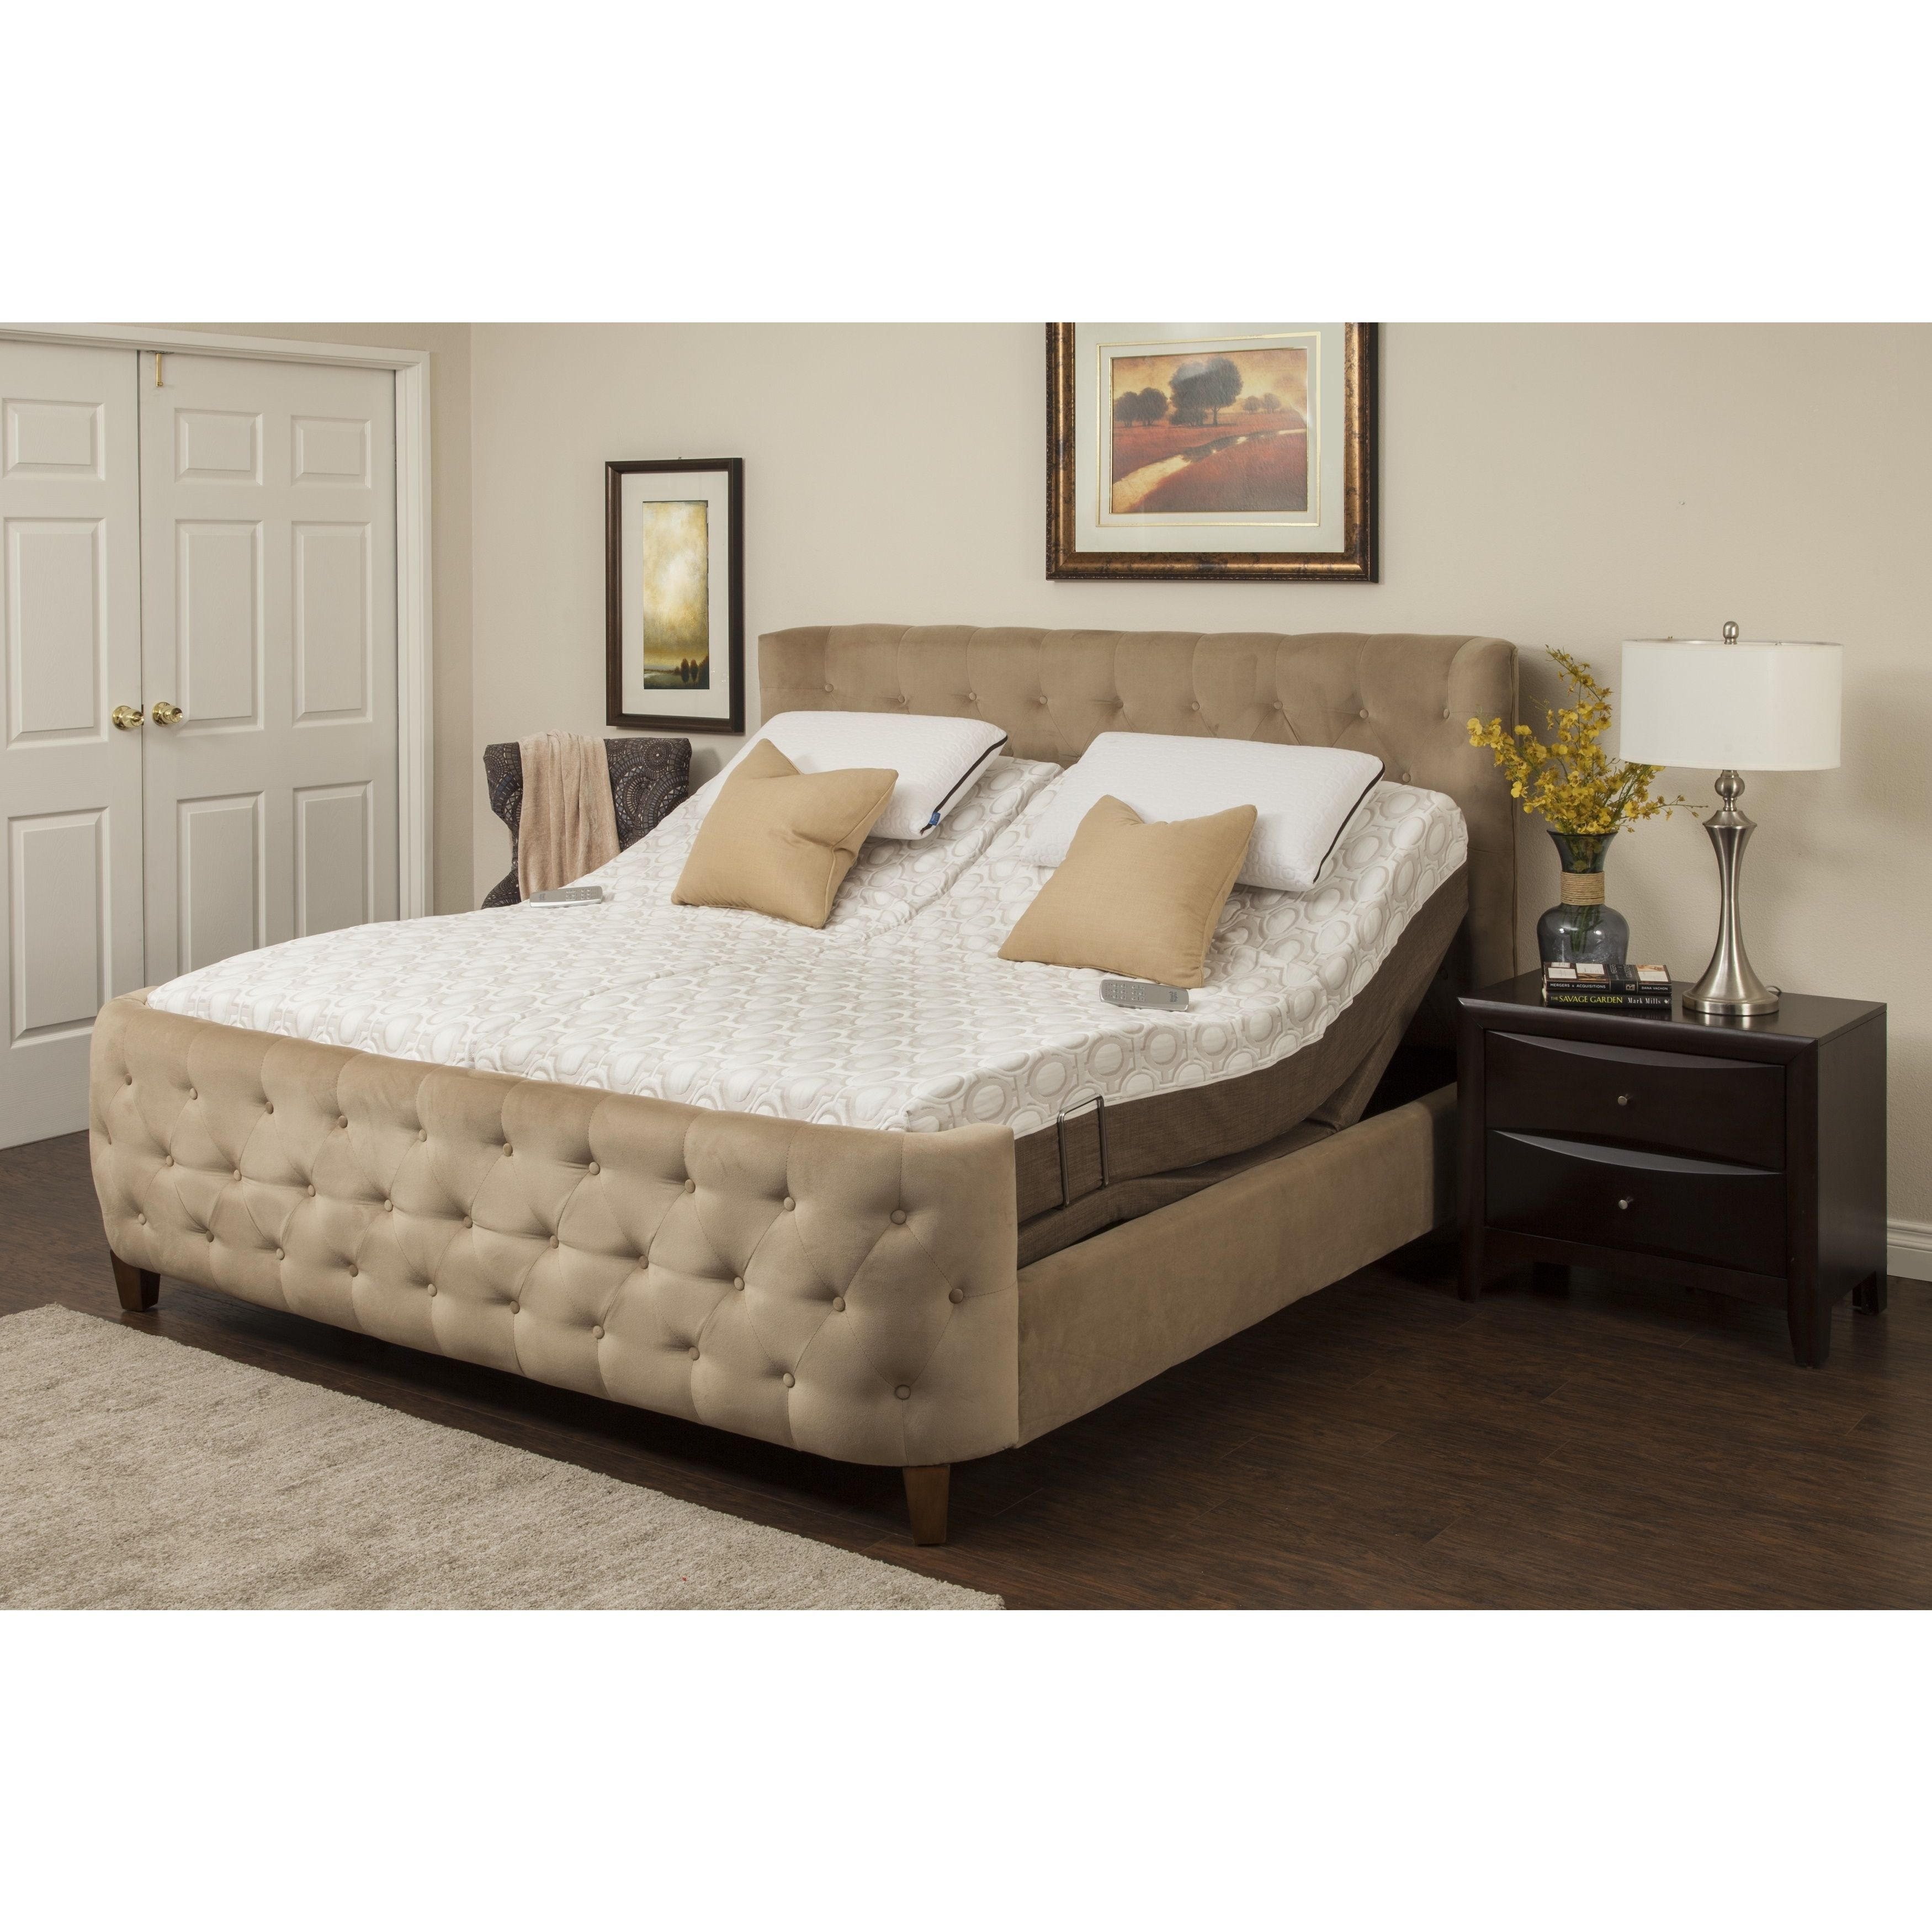 Sleep Zone Blissful Nights Dahlia 11 Inch King Size Memory Foam